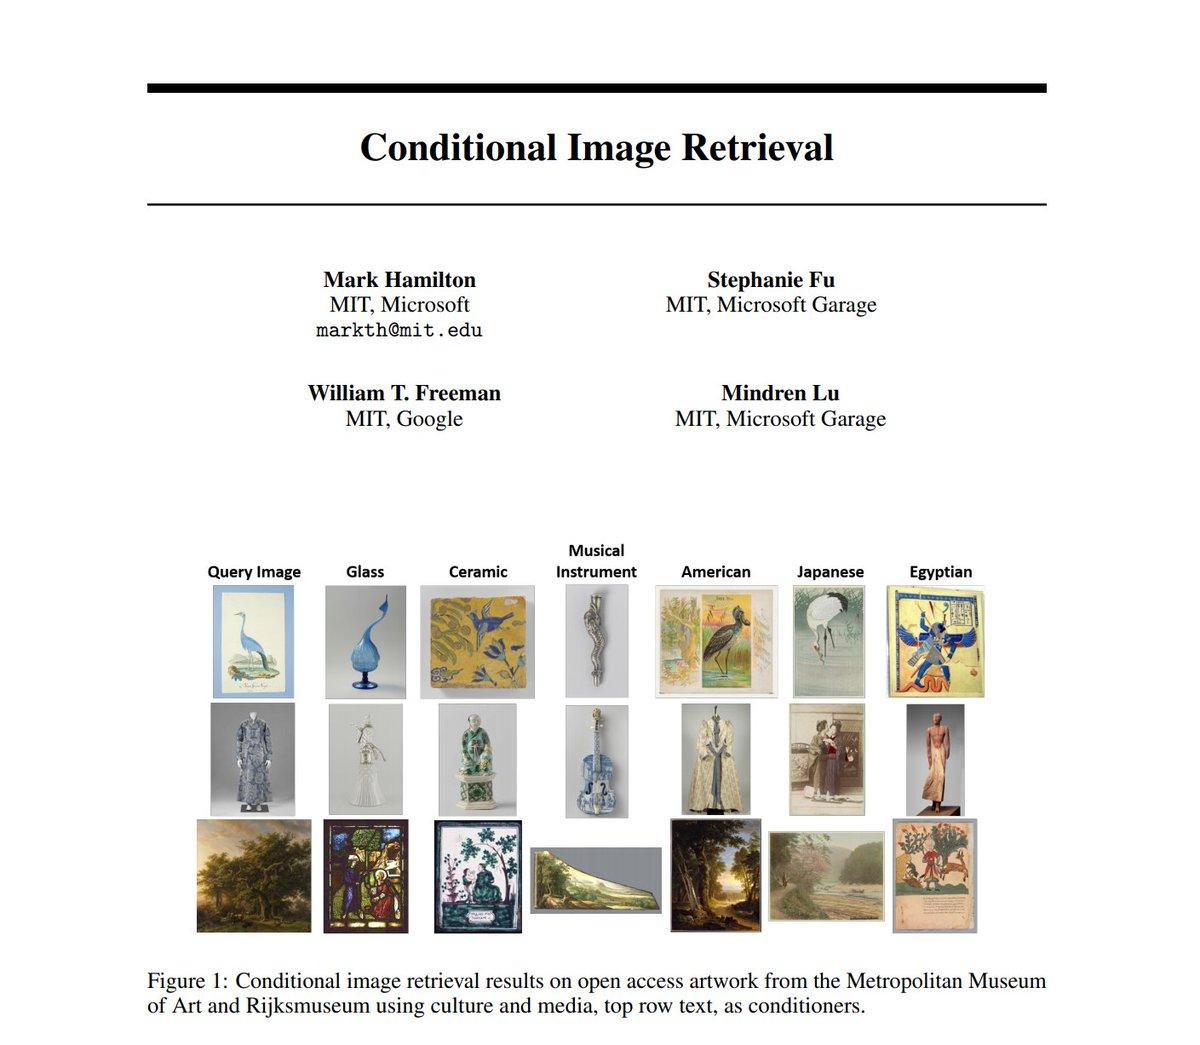 "[#FridayWiMLDSPaper 📜 curated by @lrnt_chloe] ""Conditional Image Retrieval"" by @mhamilton723, @xkungfu, William T. Freeman & Mindren Lu 🔗  #WiMLDSParis #WiMLDS #WomeninSTEM #MachineLearning"